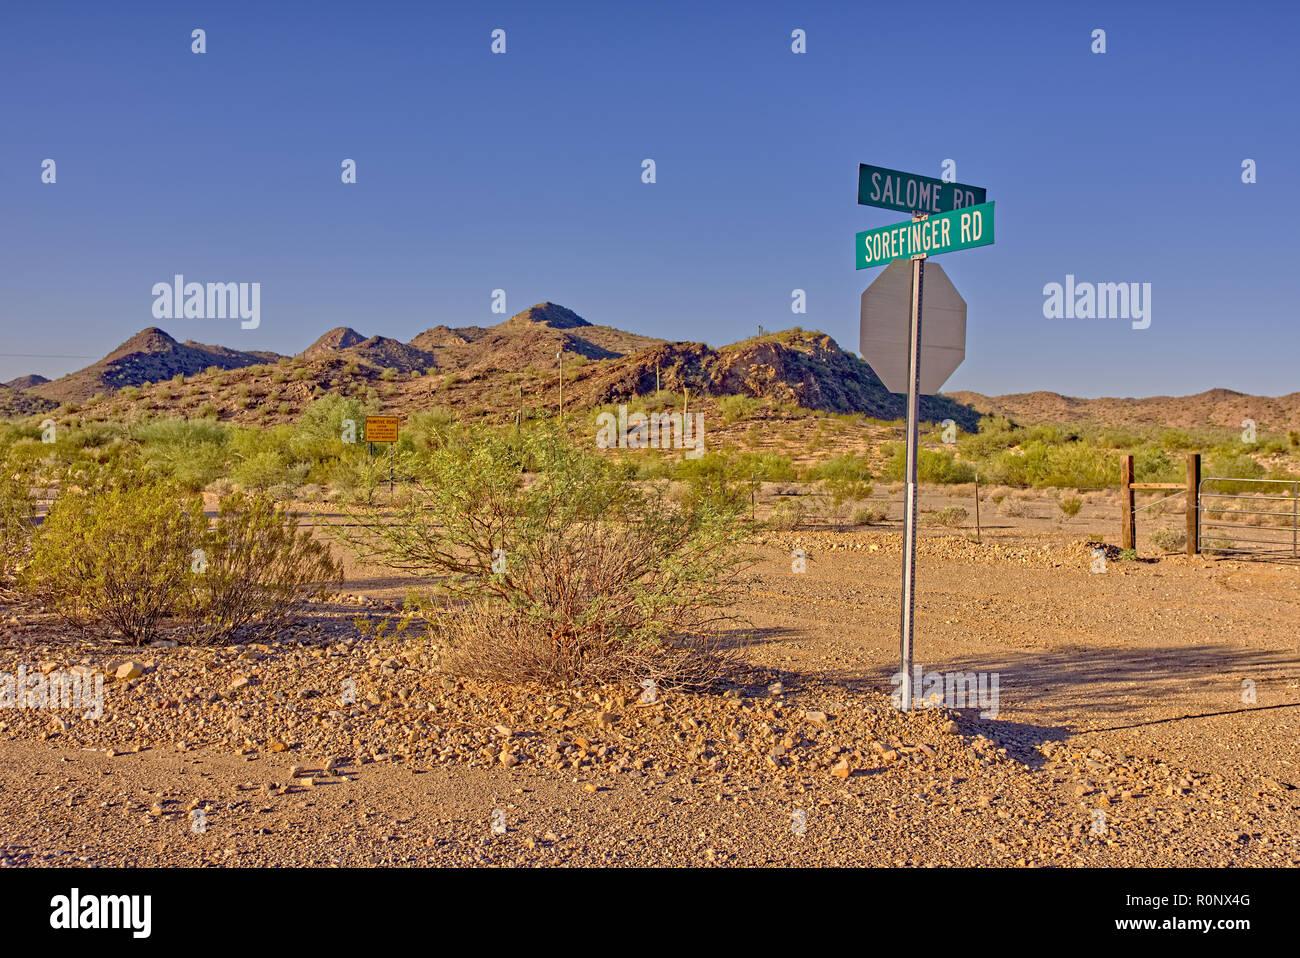 Salome and Sorefinger Road junction, Arizona, United States - Stock Image